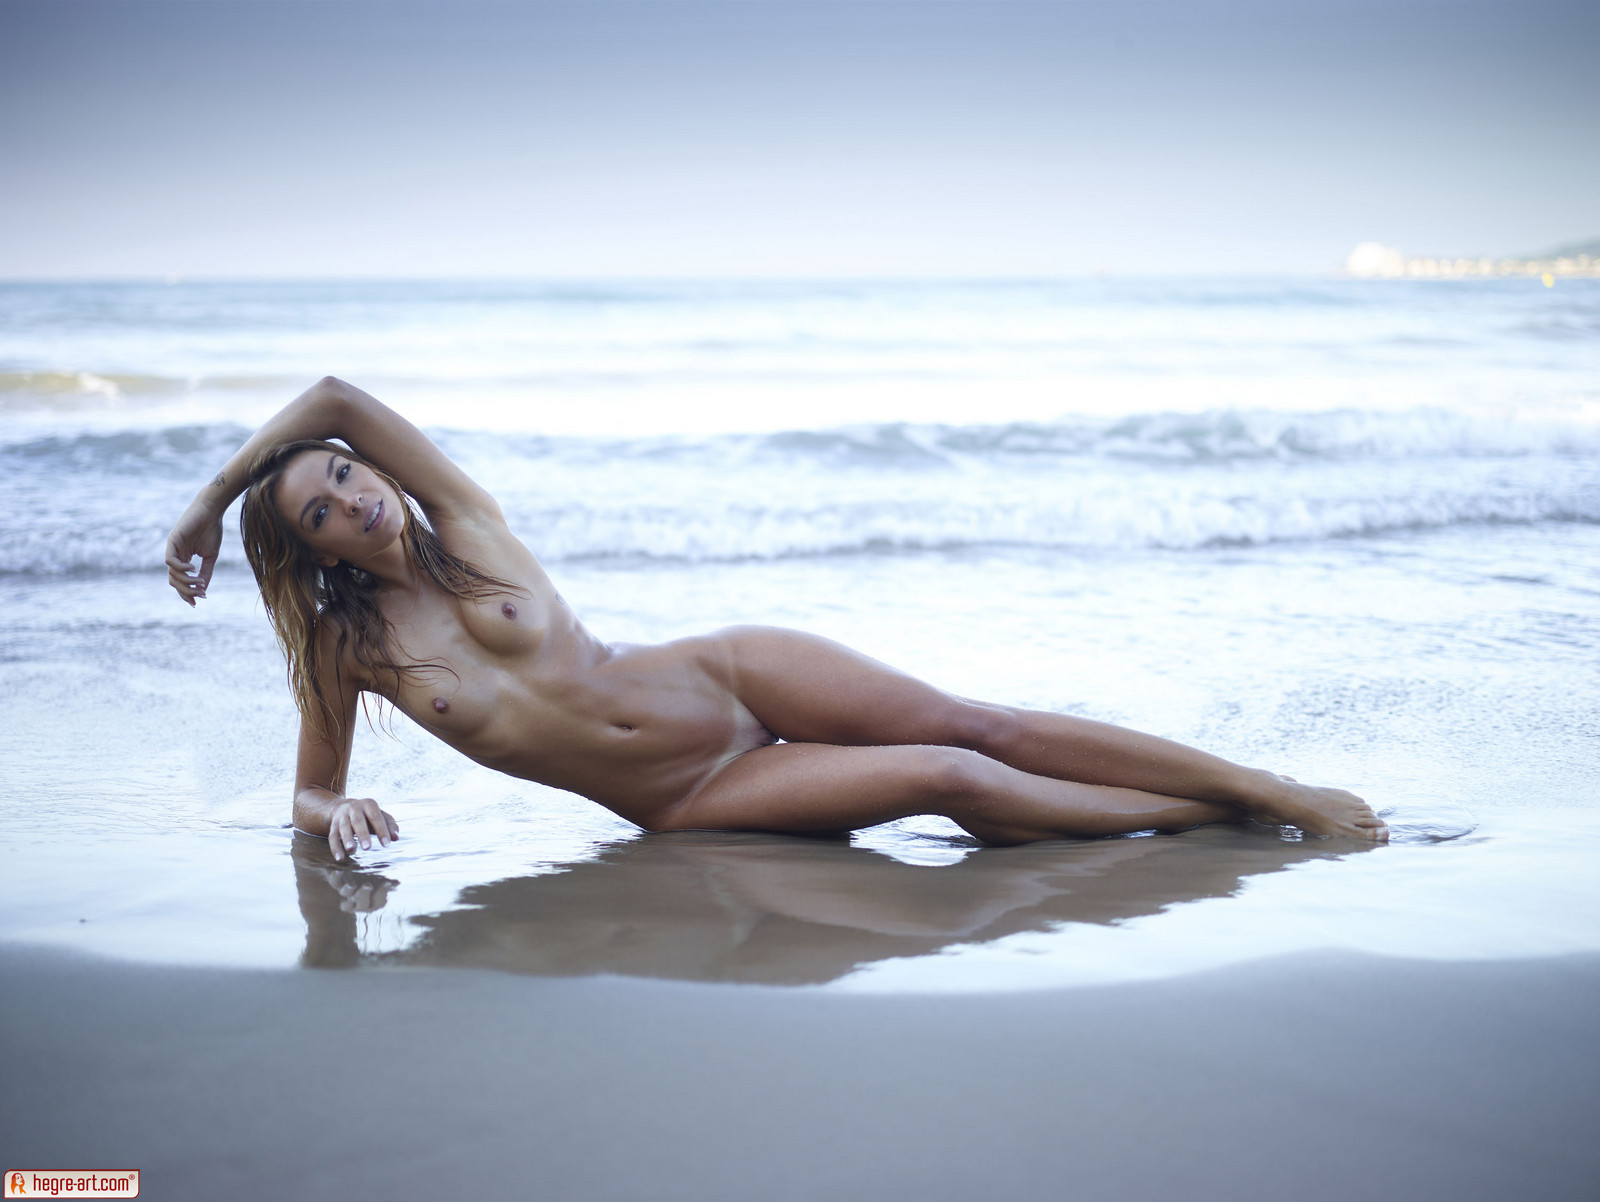 Amber In Beach Games By Hegre-Art 16 Photos  Erotic -3196